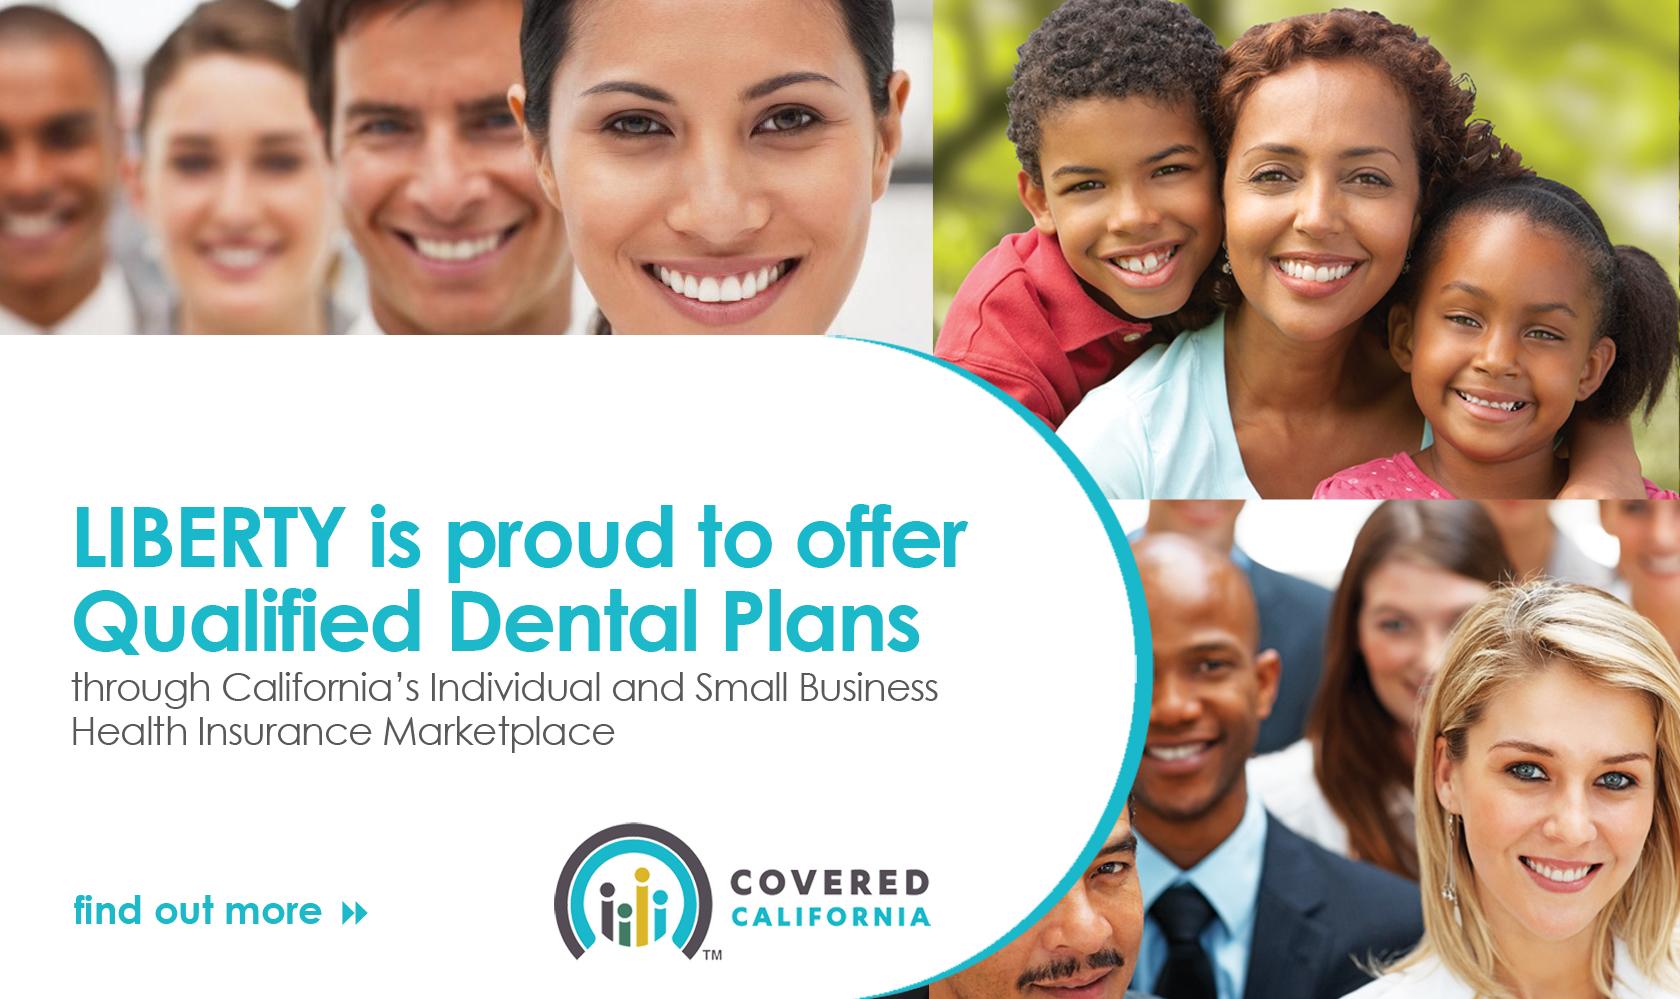 Liberty dental plan making members shine medicaid experience texas activities member testimonials covered california publicscrutiny Choice Image